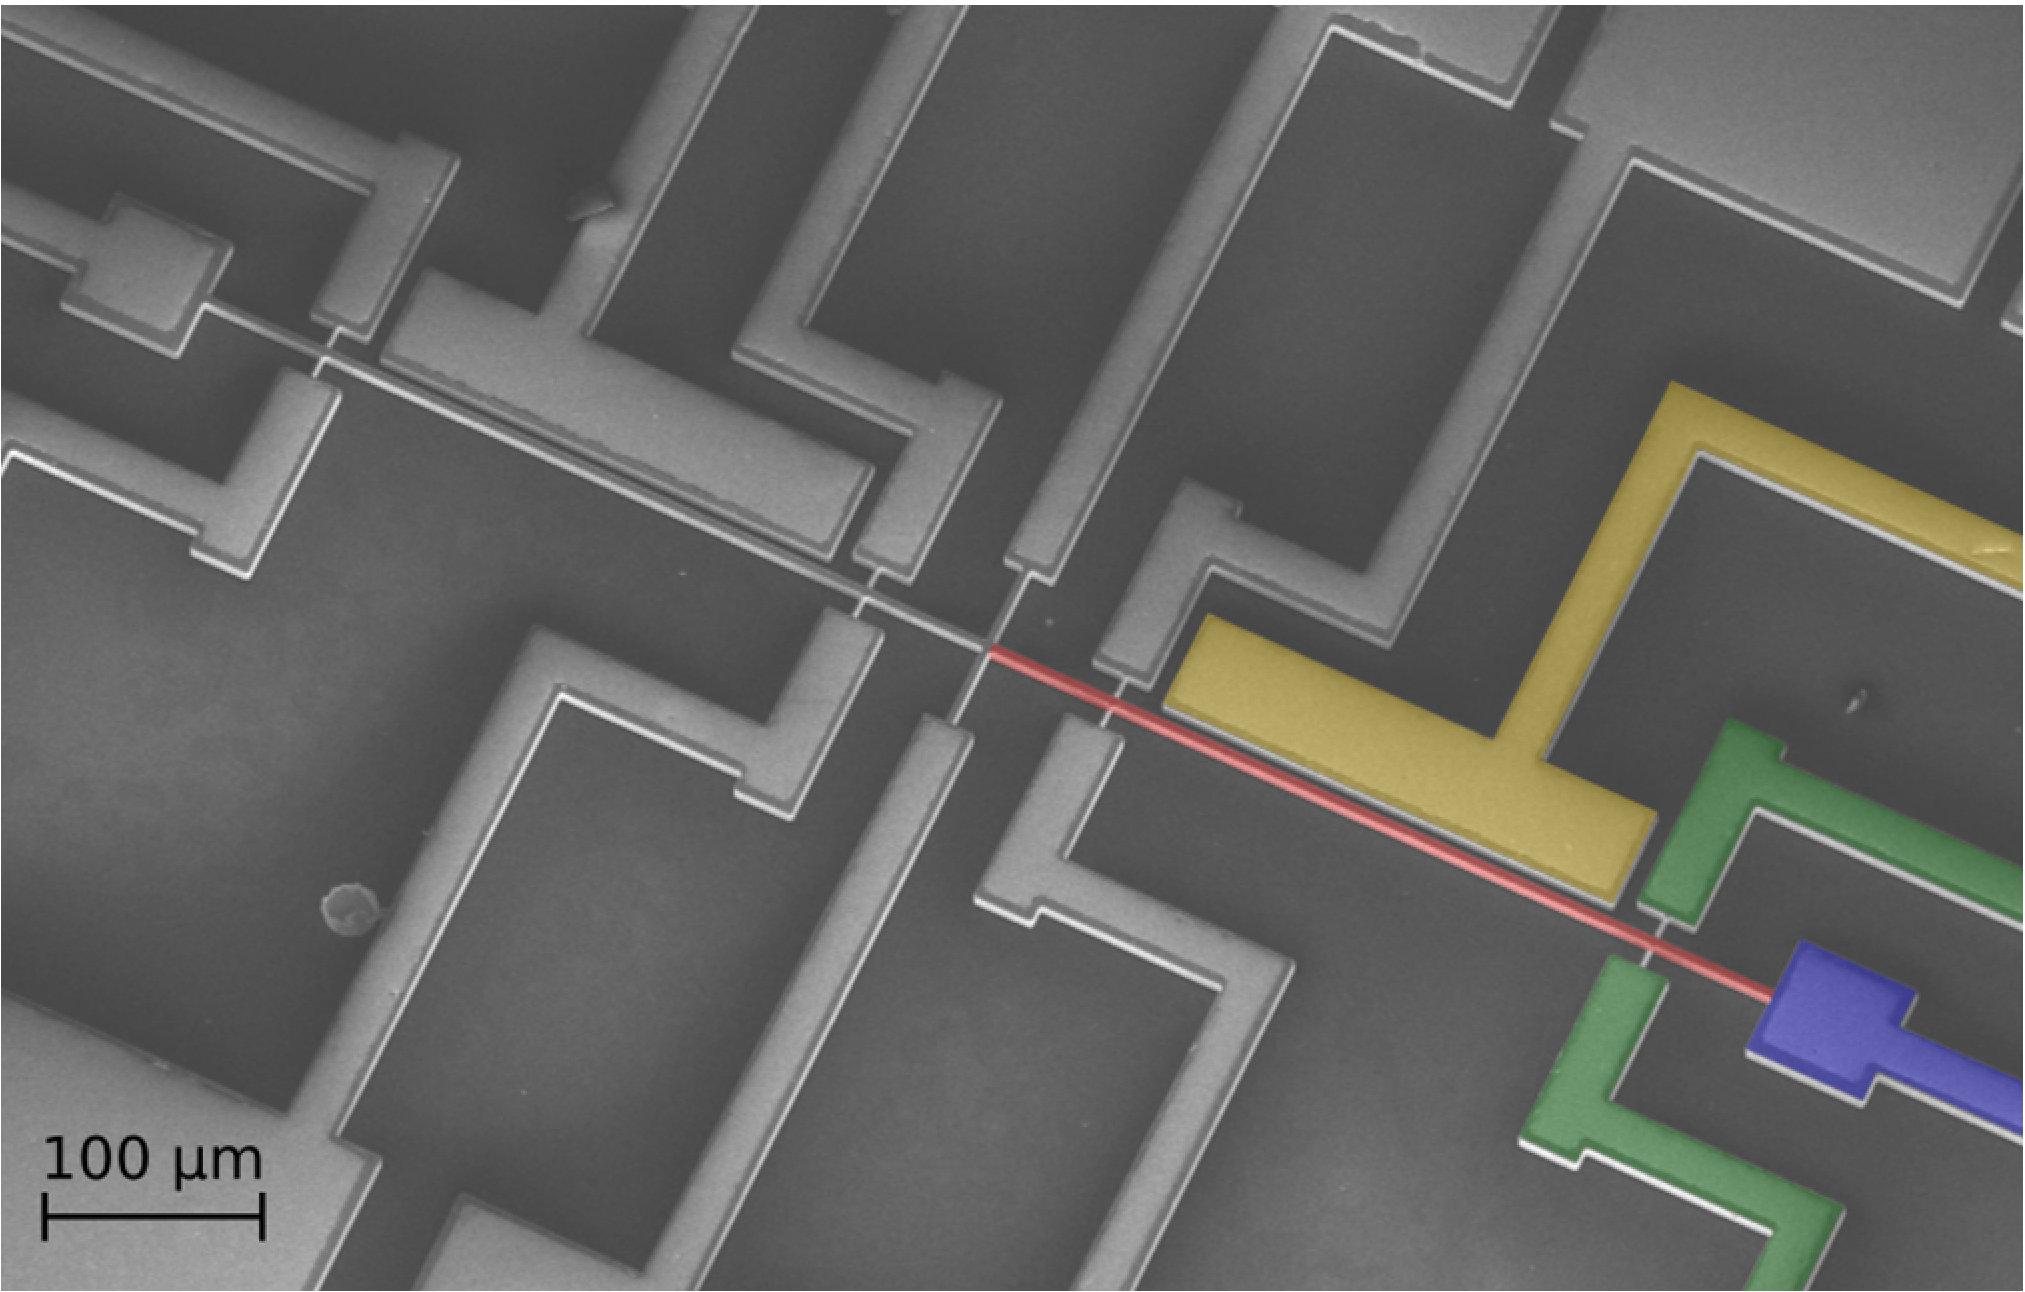 New reservoir computer marks first-ever microelectromechanical neural network application